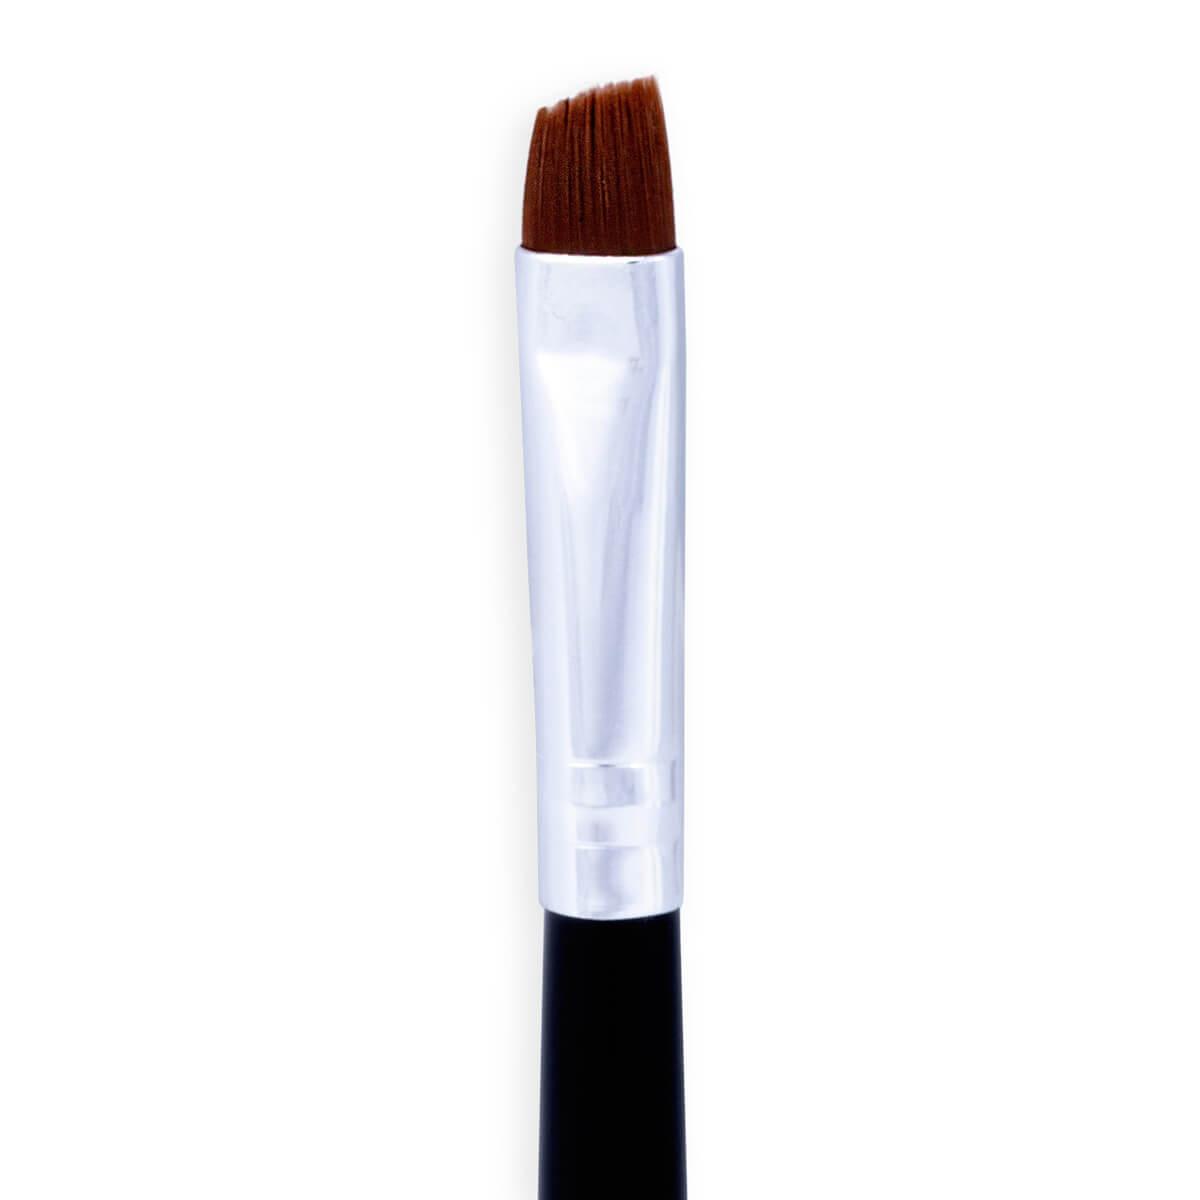 S157 - Pincel Chanfrado Para Delinear Profissional Sffumato Beauty